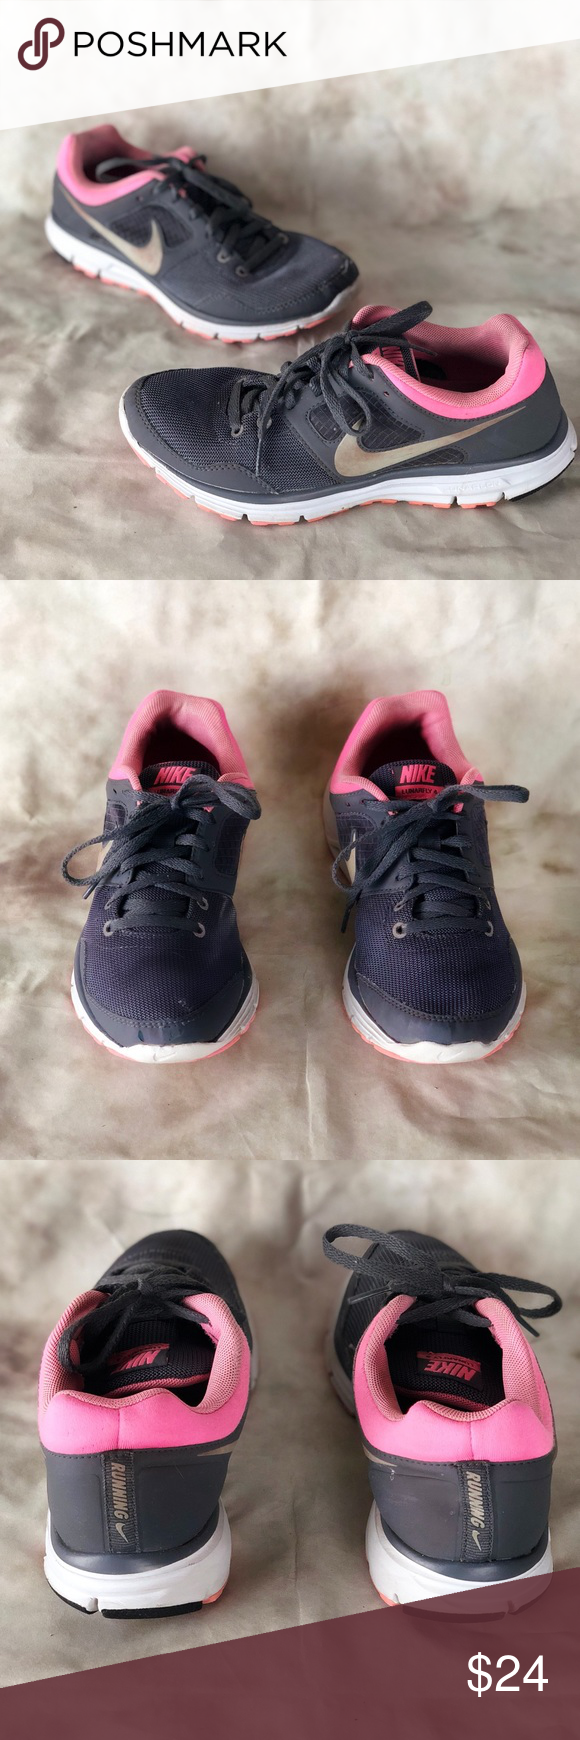 Mujeres Nike Zapatillas Lunarfly Running zapatilla Running Zapatillas Nike Rosa dccec8